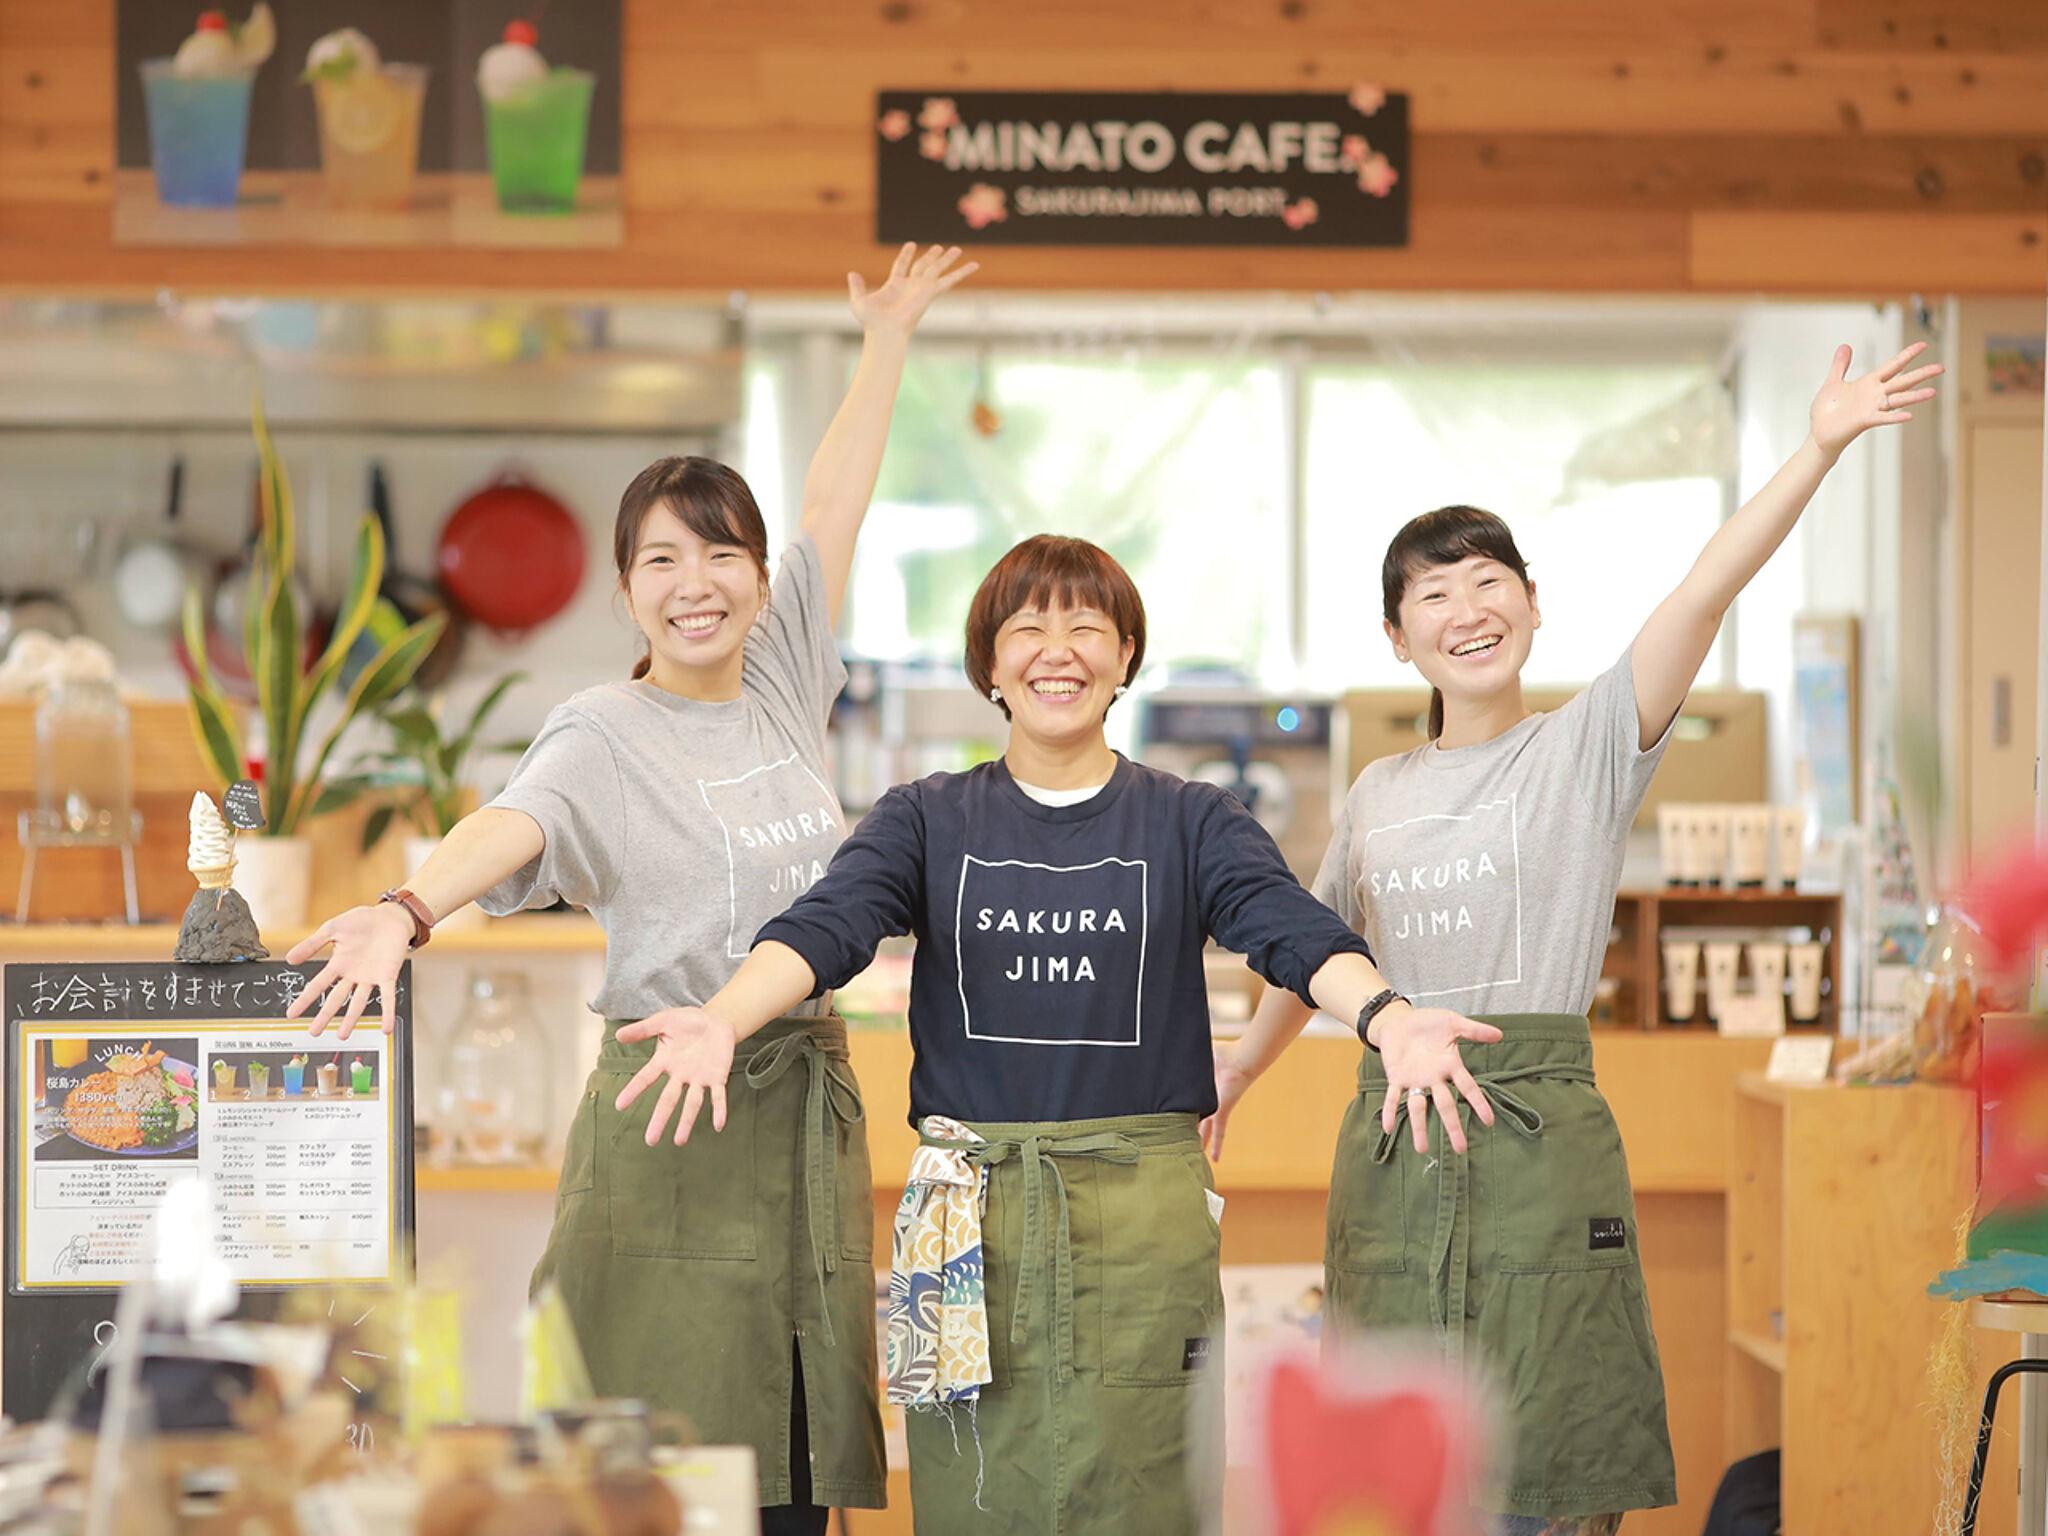 minato cafe